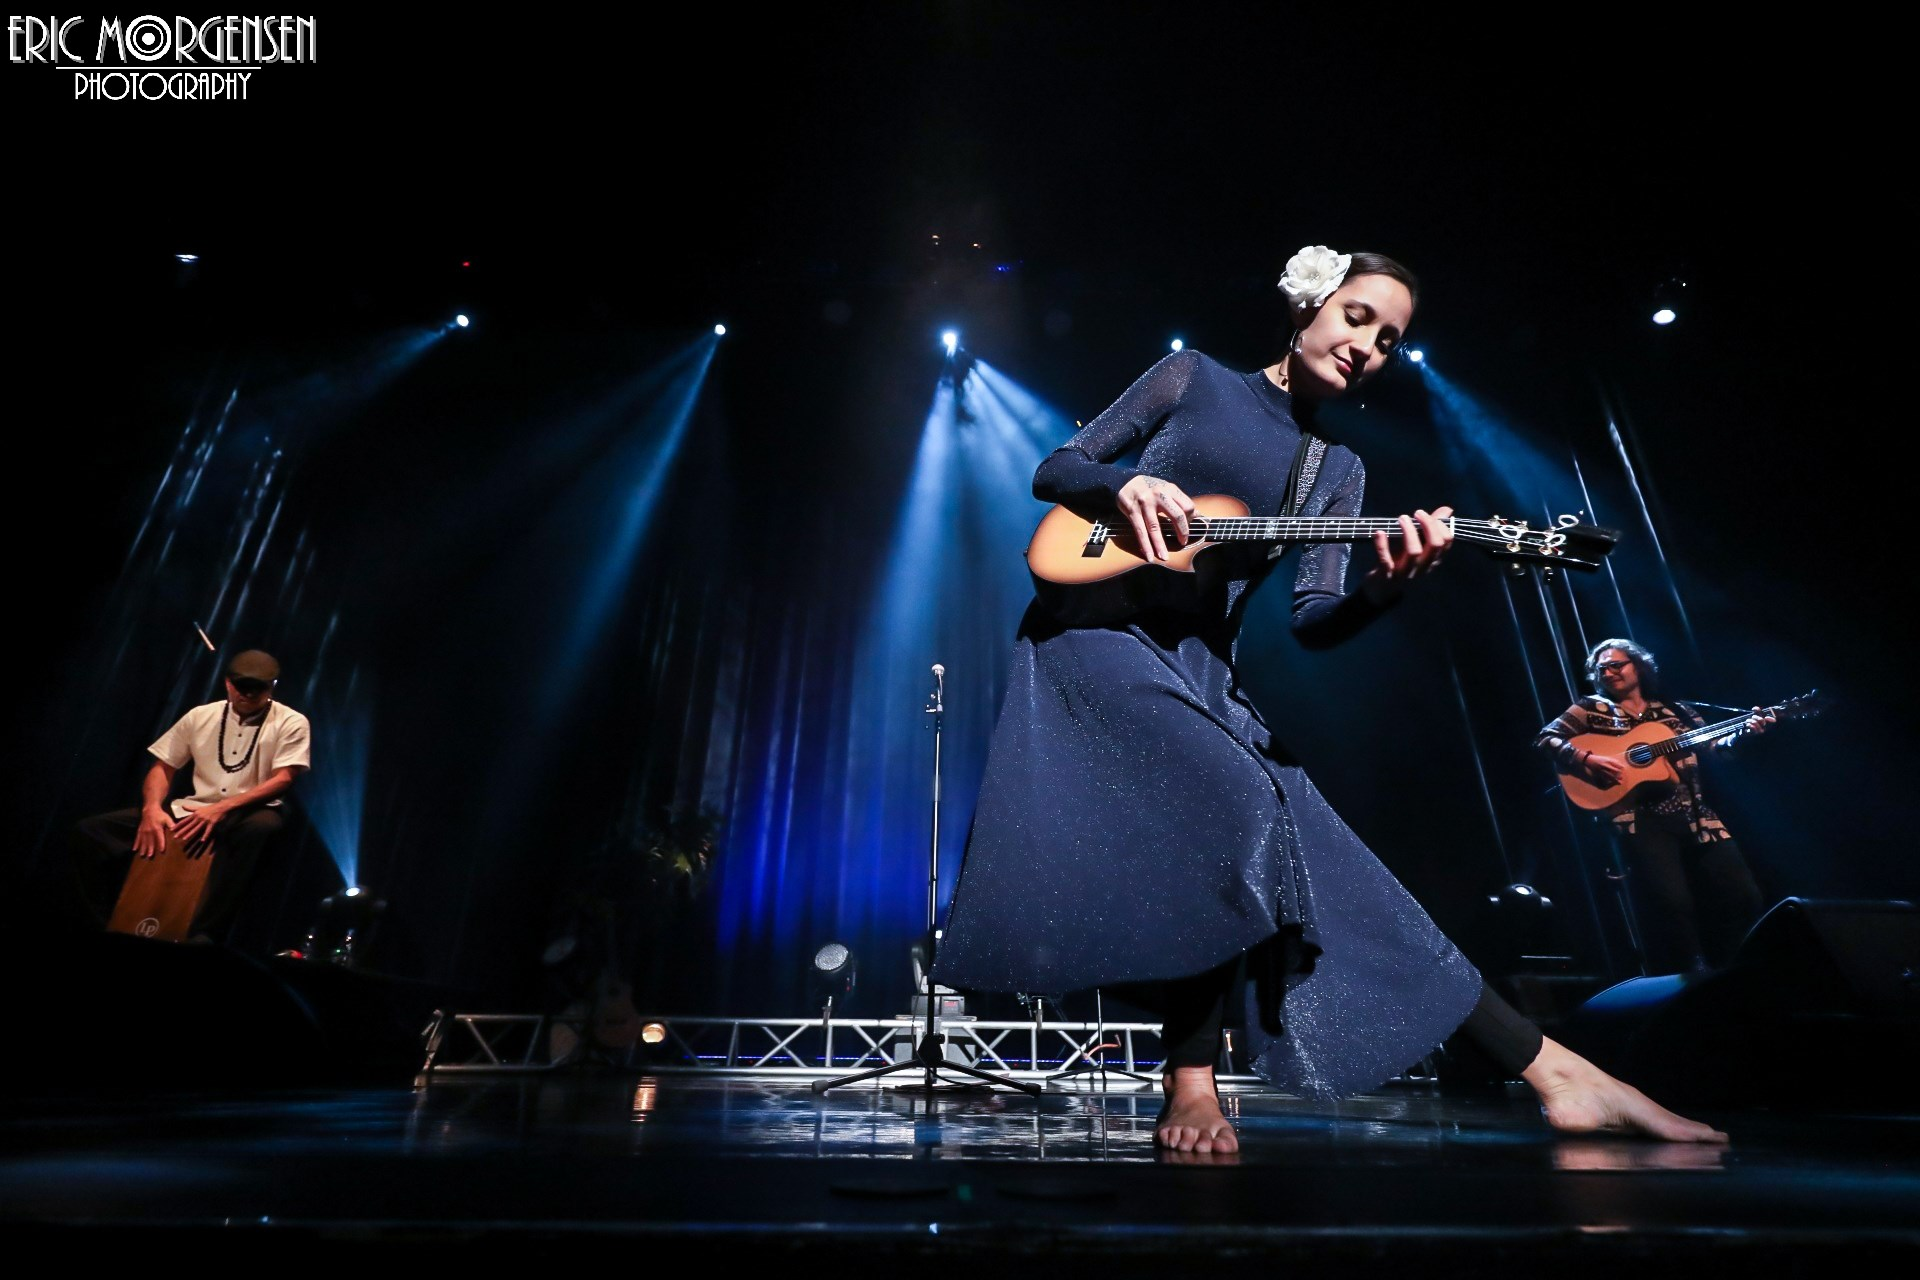 2019-05-16 - Admiral Theatre - Bremberton WA_17.jpg